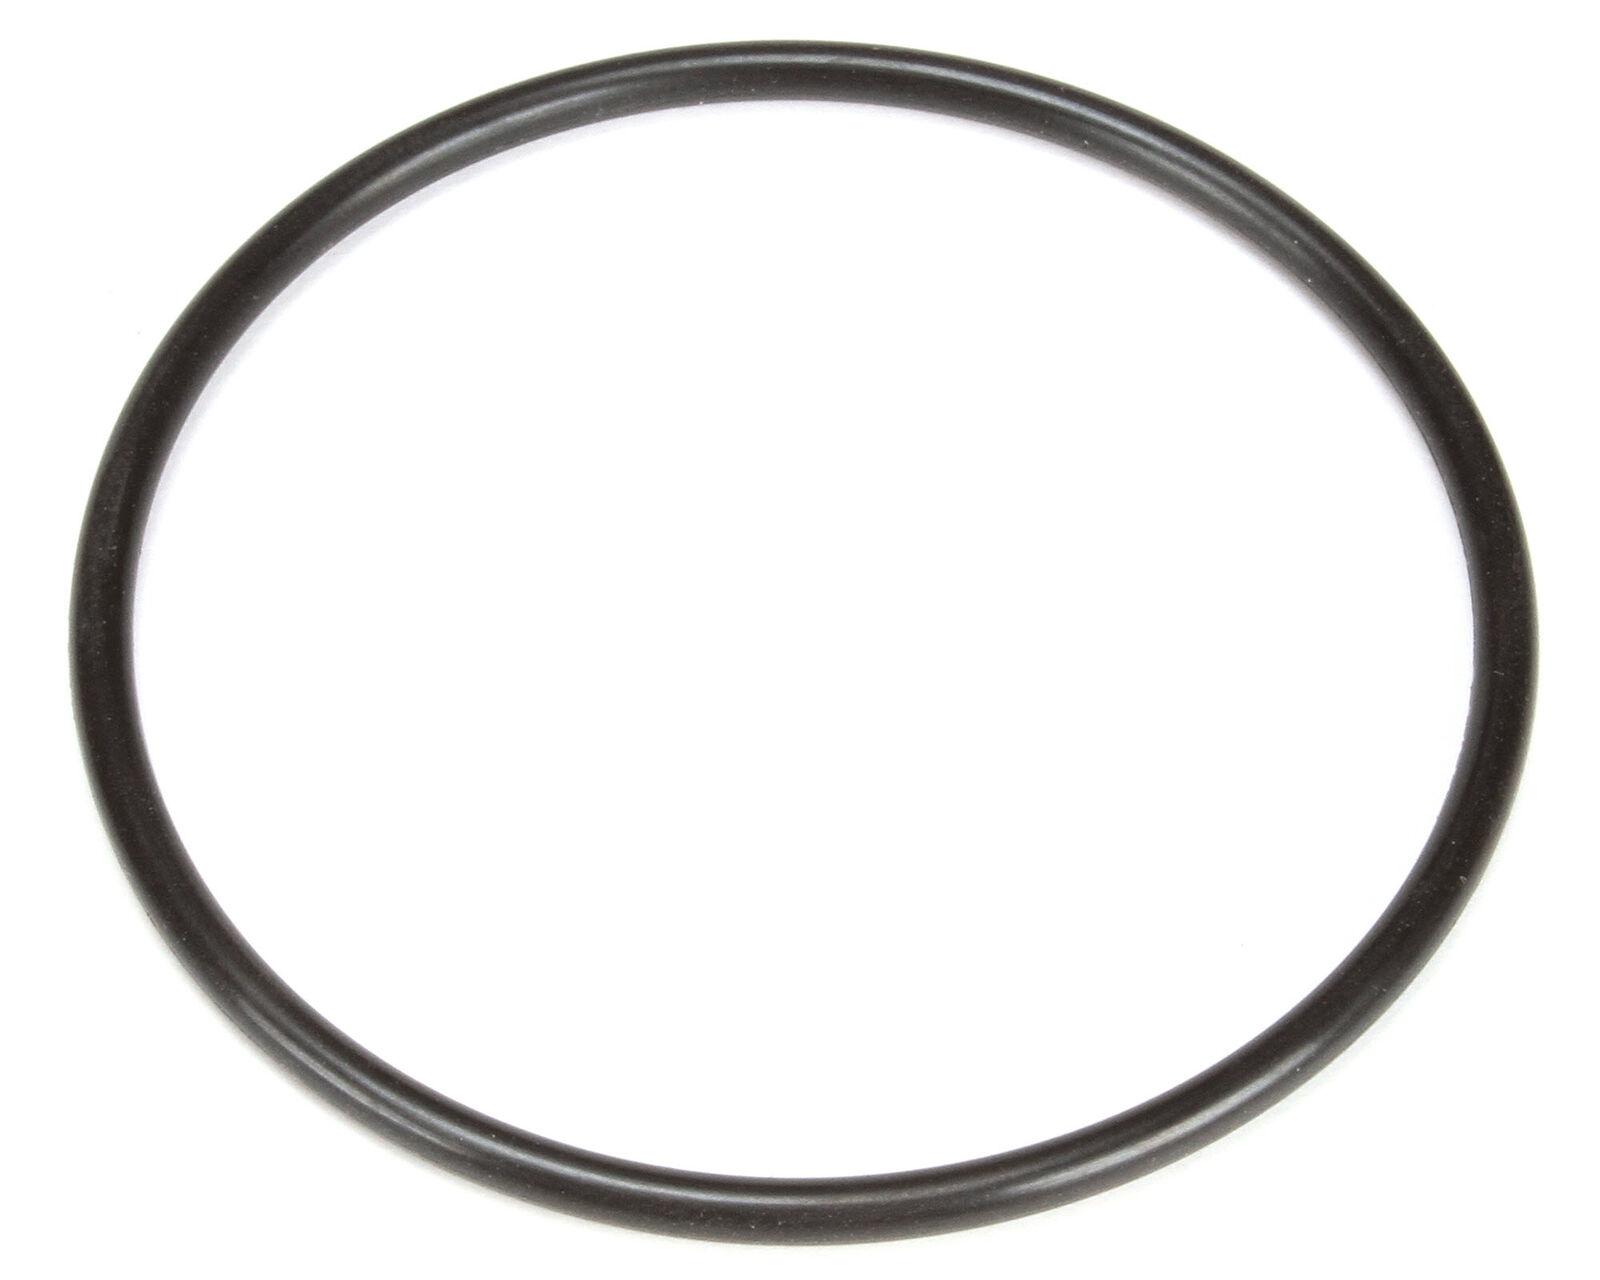 Hoshizaki O-Ring 4A4755-01